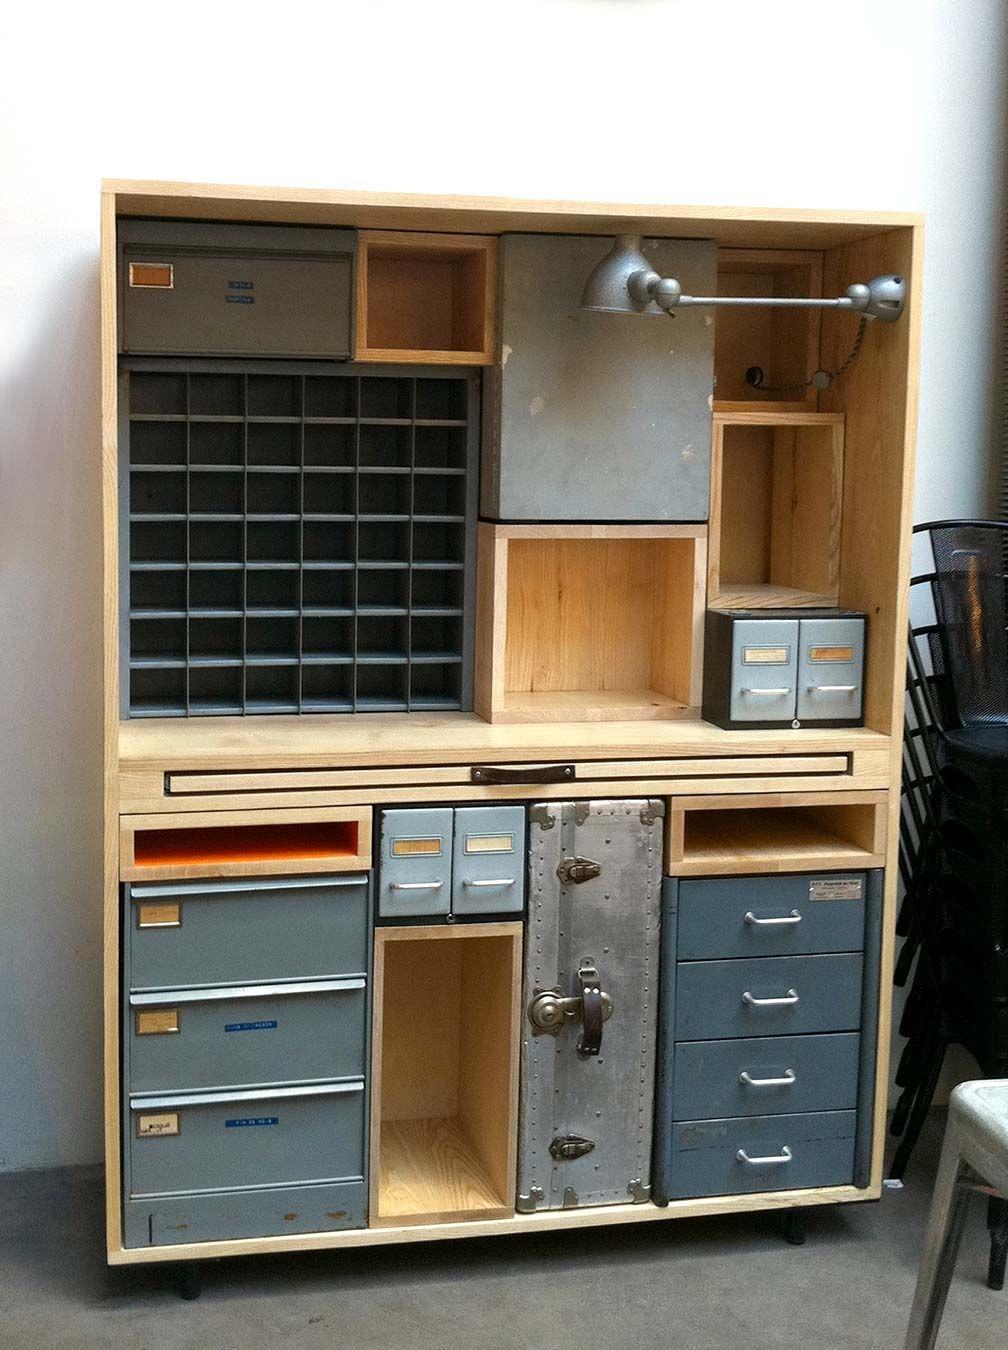 Stk Cigue Rolling Workbench Home Office Storage